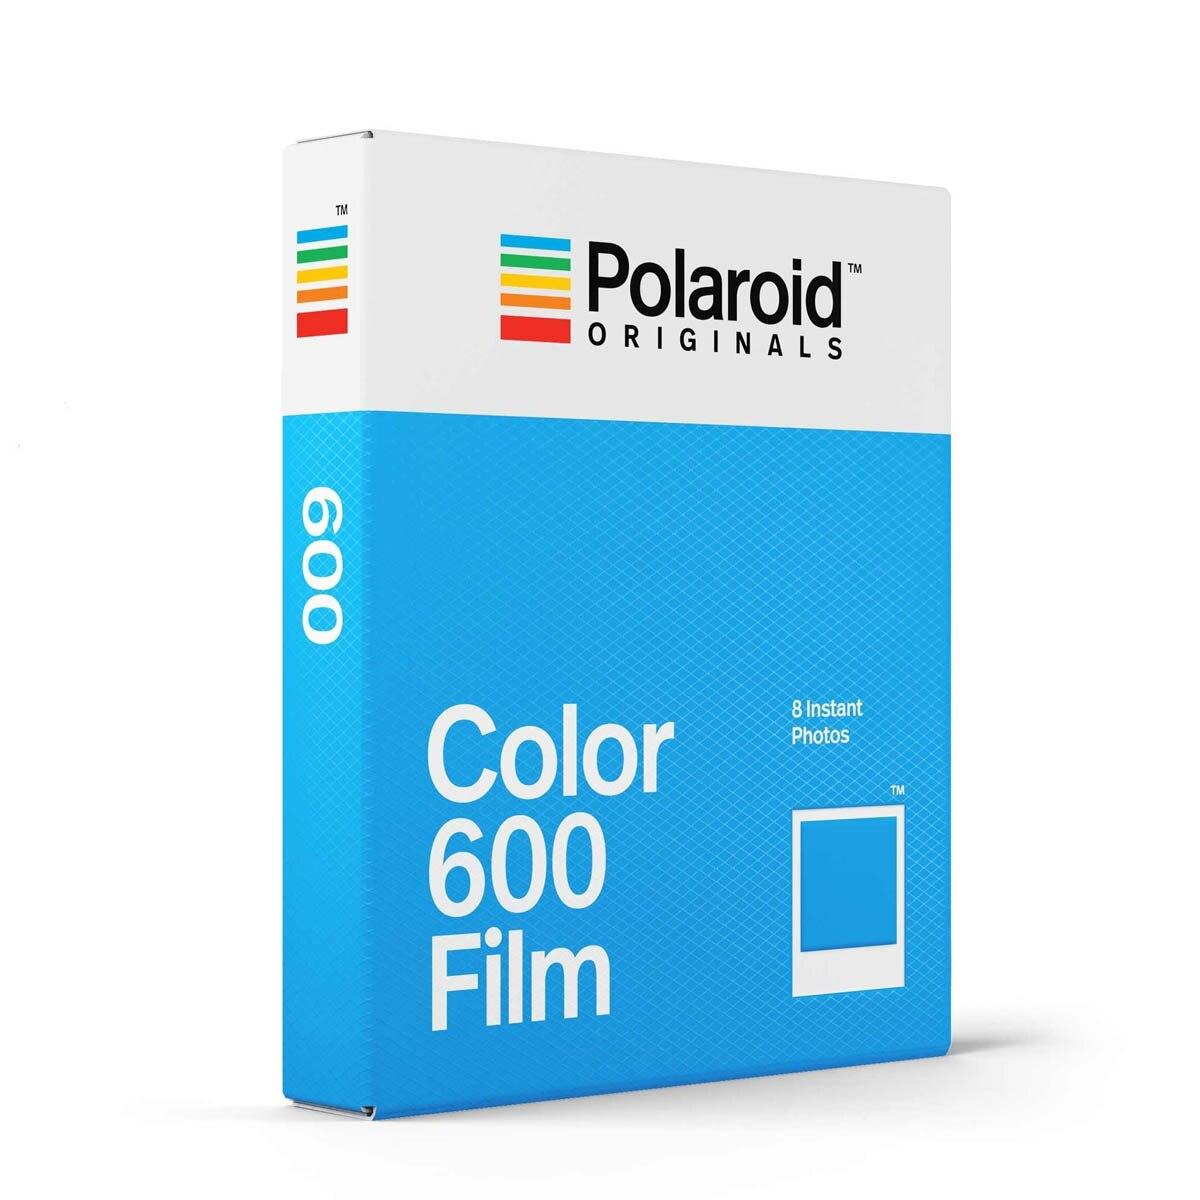 Originals Color 600 Film 8 Sheets Instant Photos White Frame Paper for Vintage 600 636 Closeup